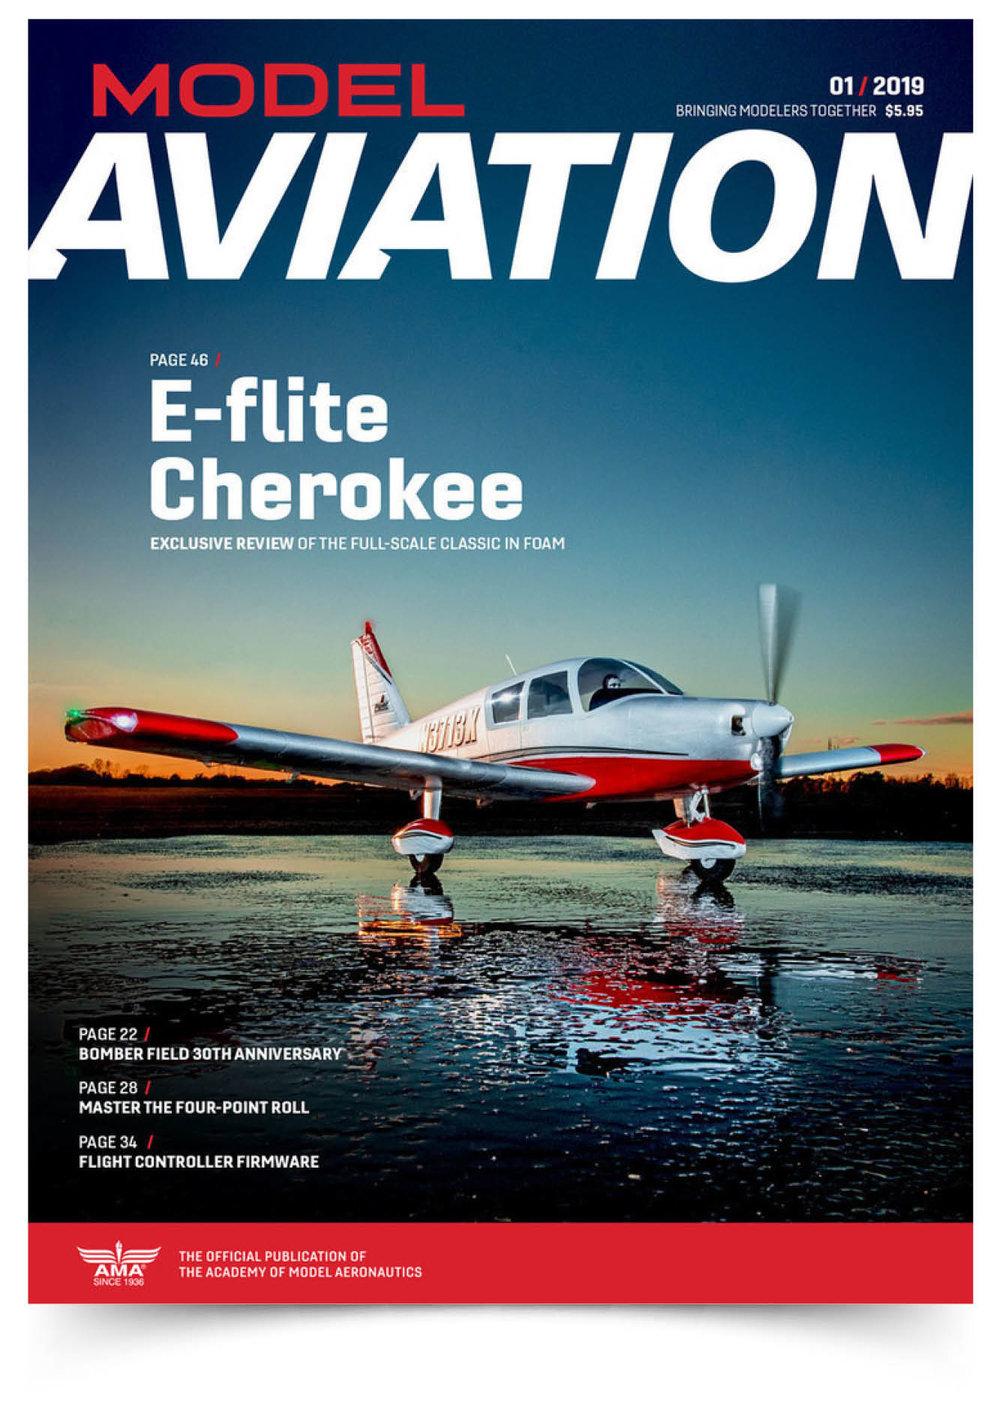 ProductShot_Model Aviation.jpg